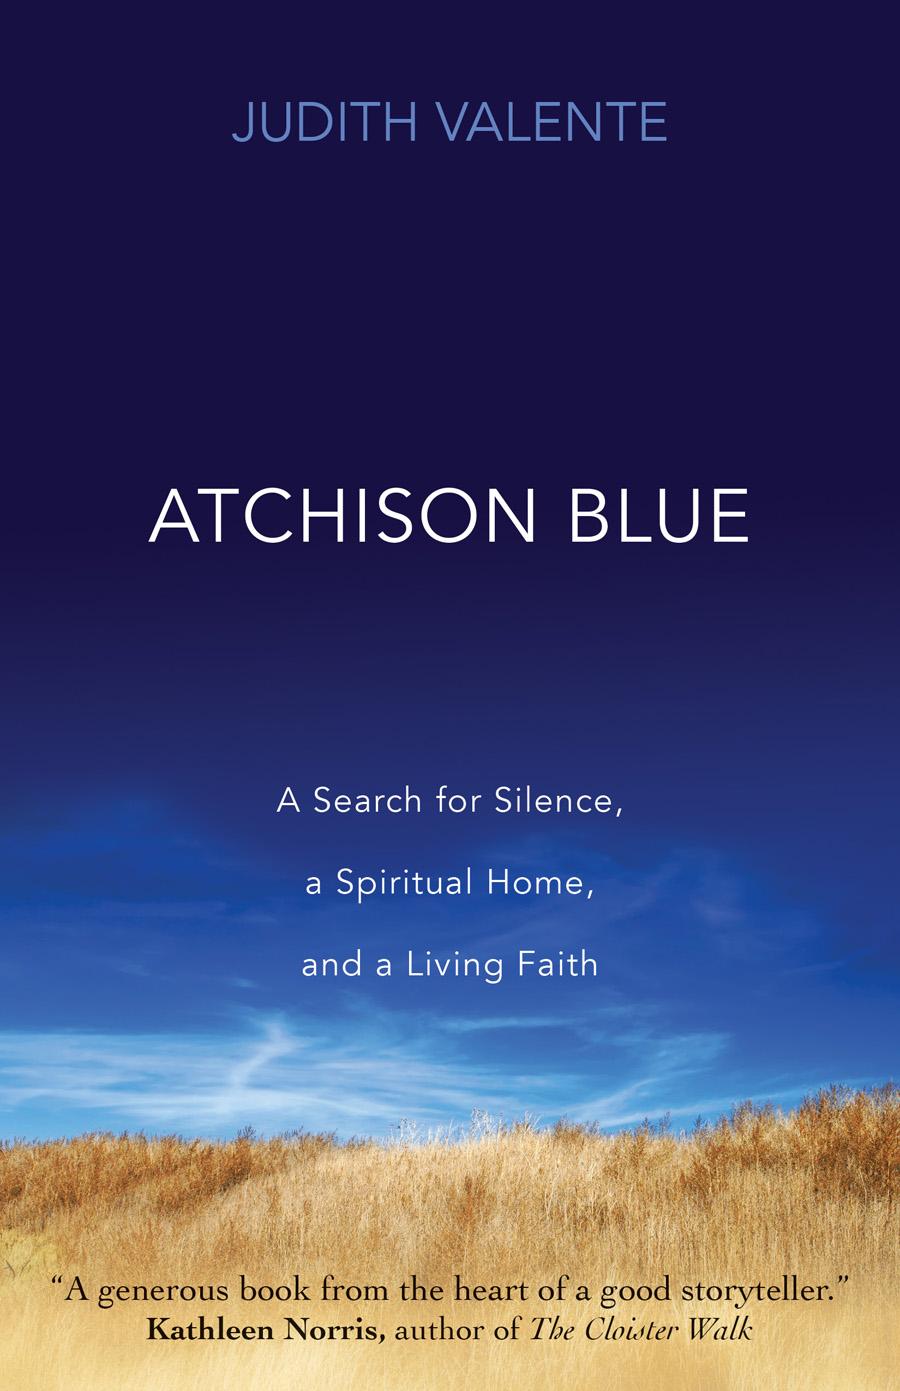 Atchison Blue